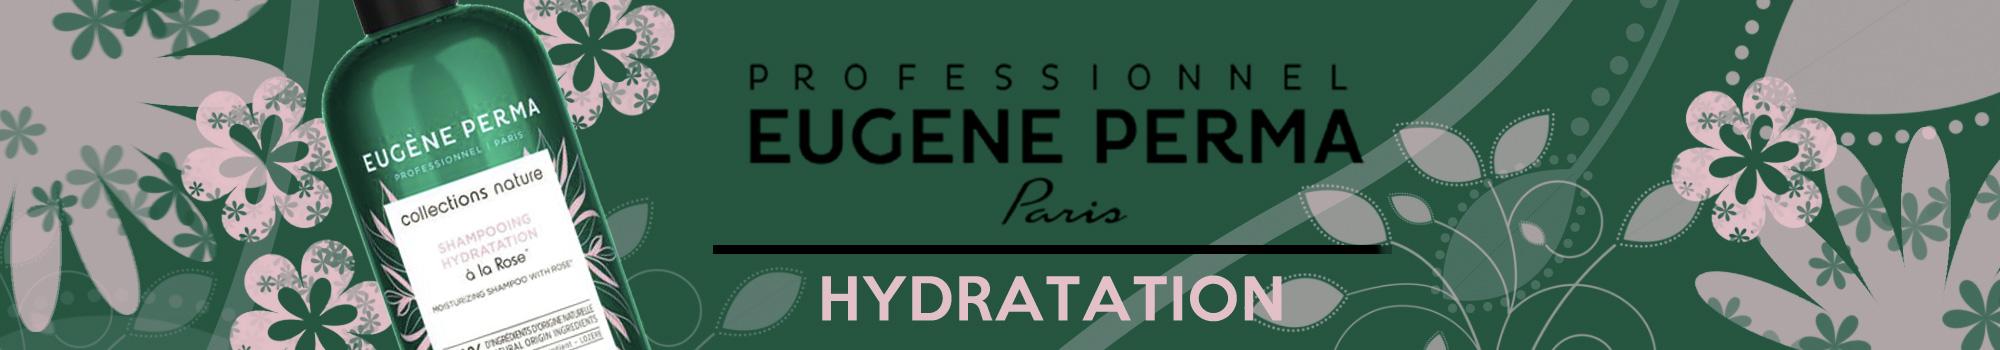 Collections Nature Hydratation Eugène Perma